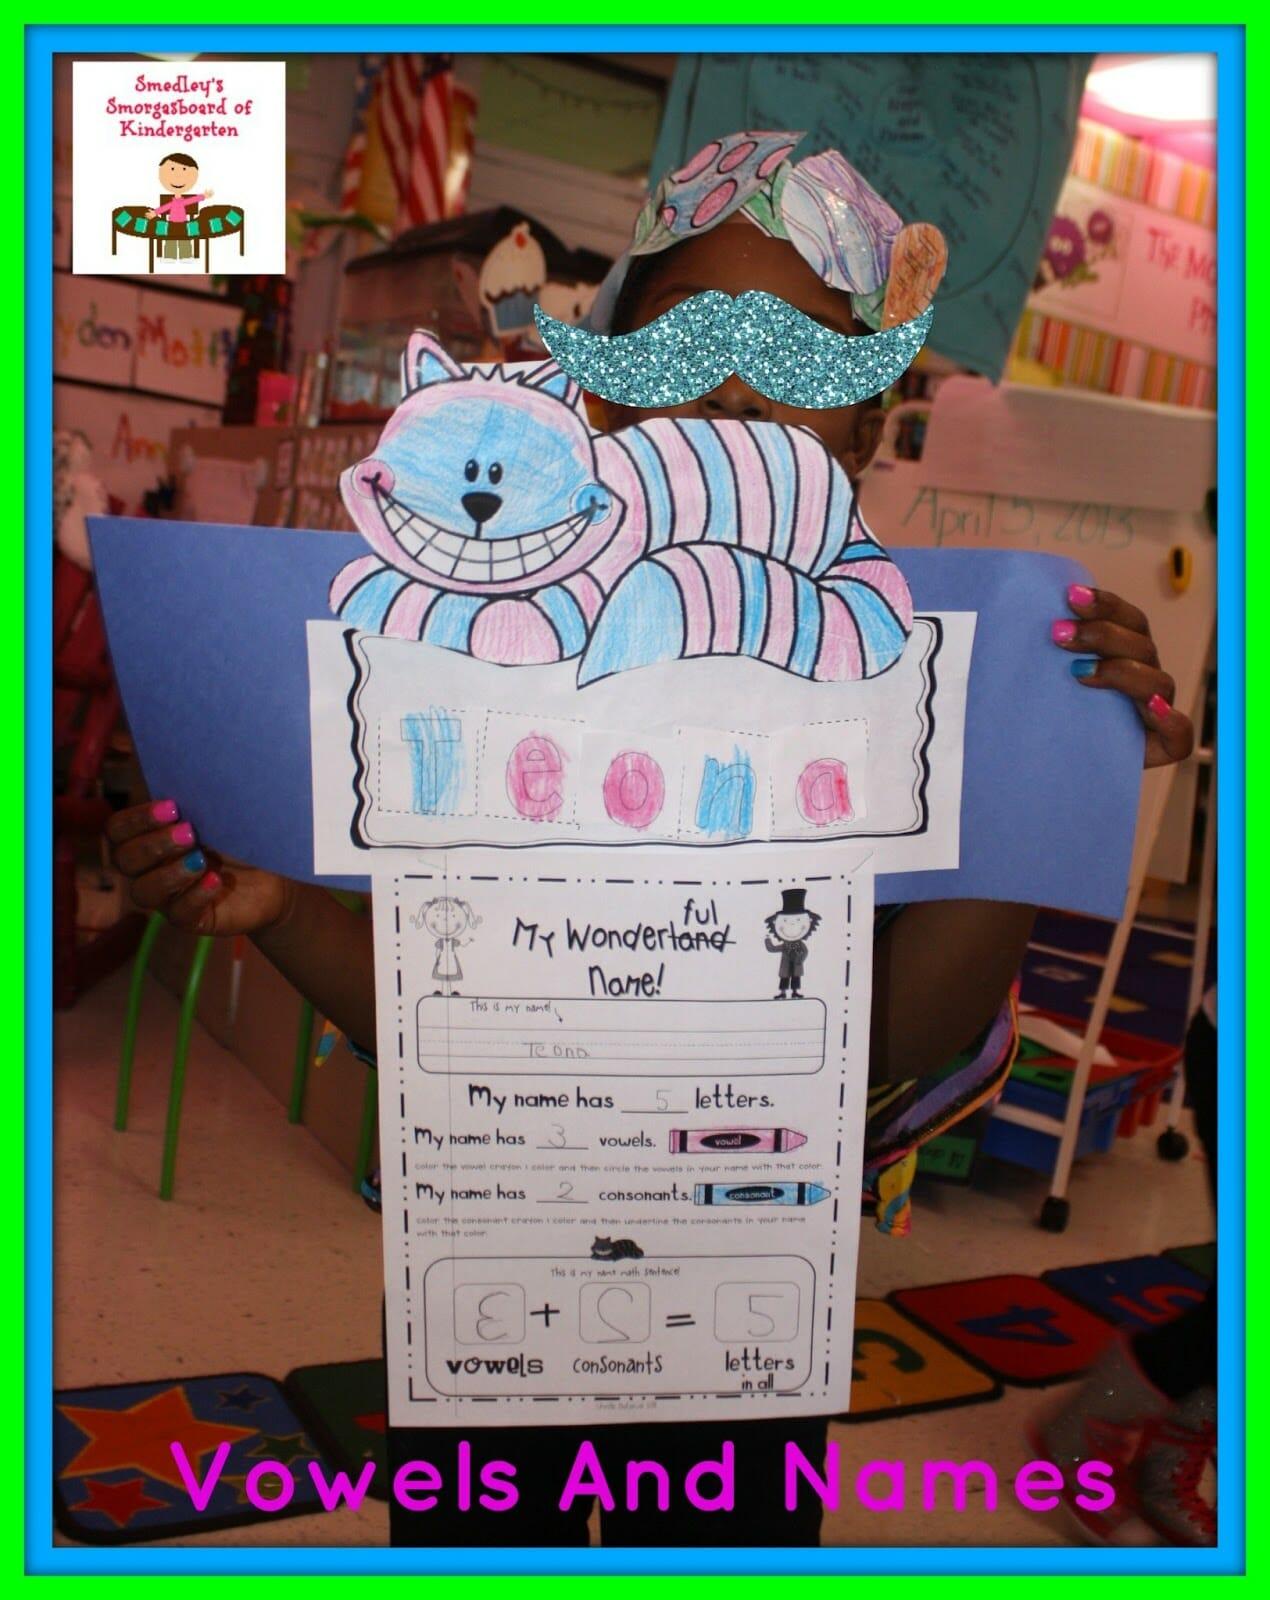 A Kindergarten Smorgasboard Saturday Kindergarten Post